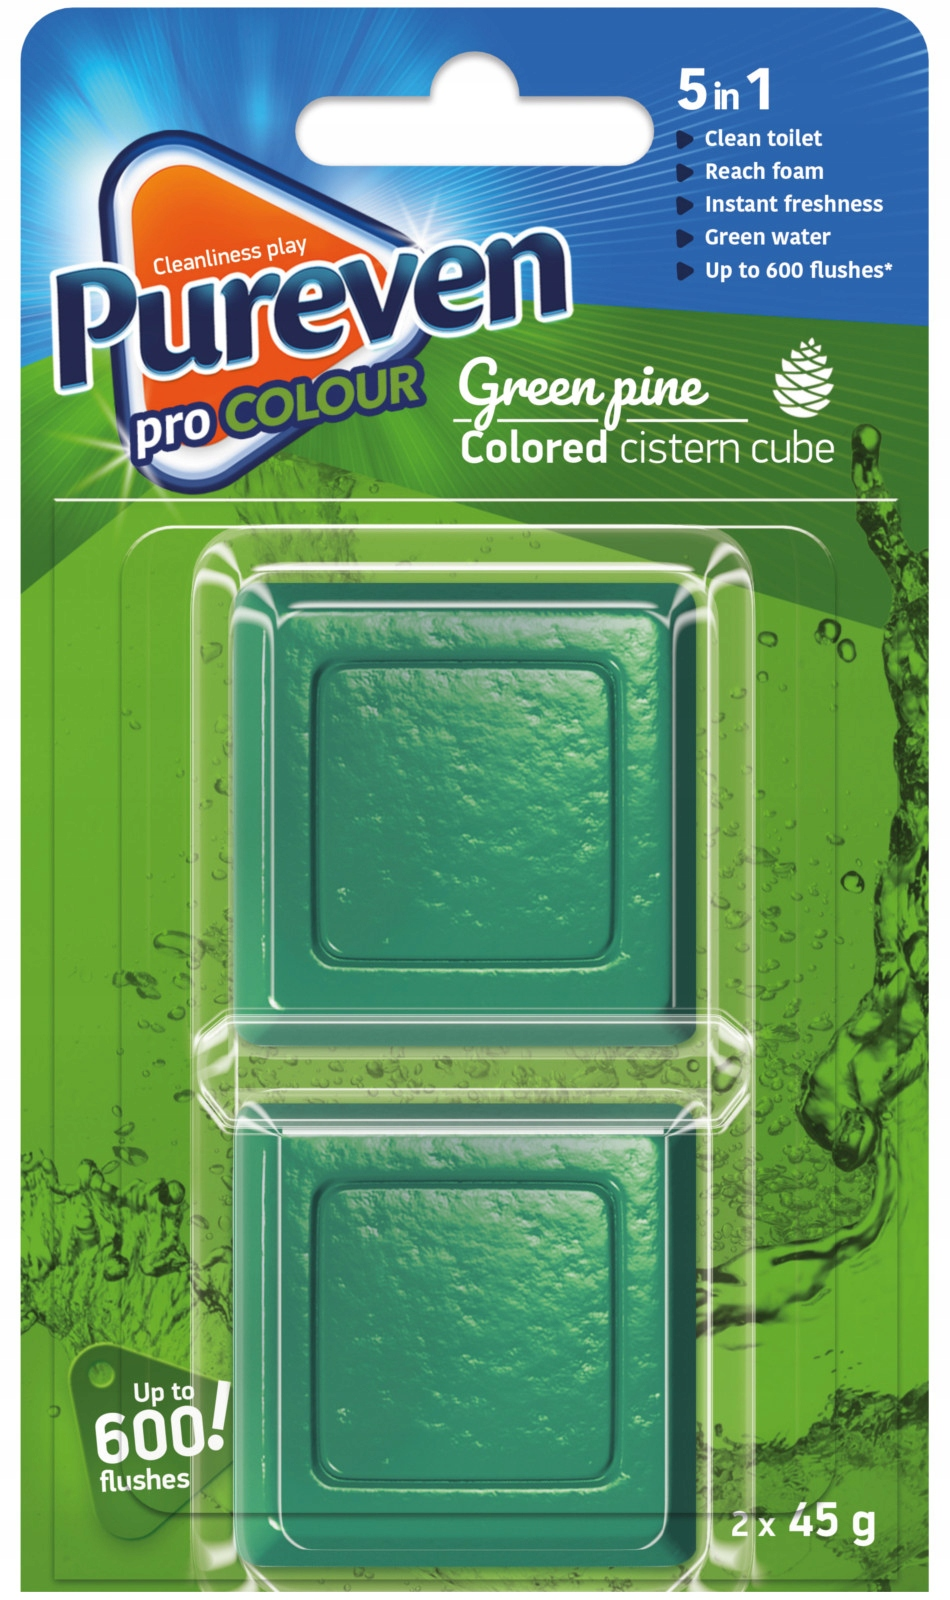 Pureven Green Программа Куб для Мухобойки ТУАЛЕТ x2 ВЕЛИКОБРИТАНИИ